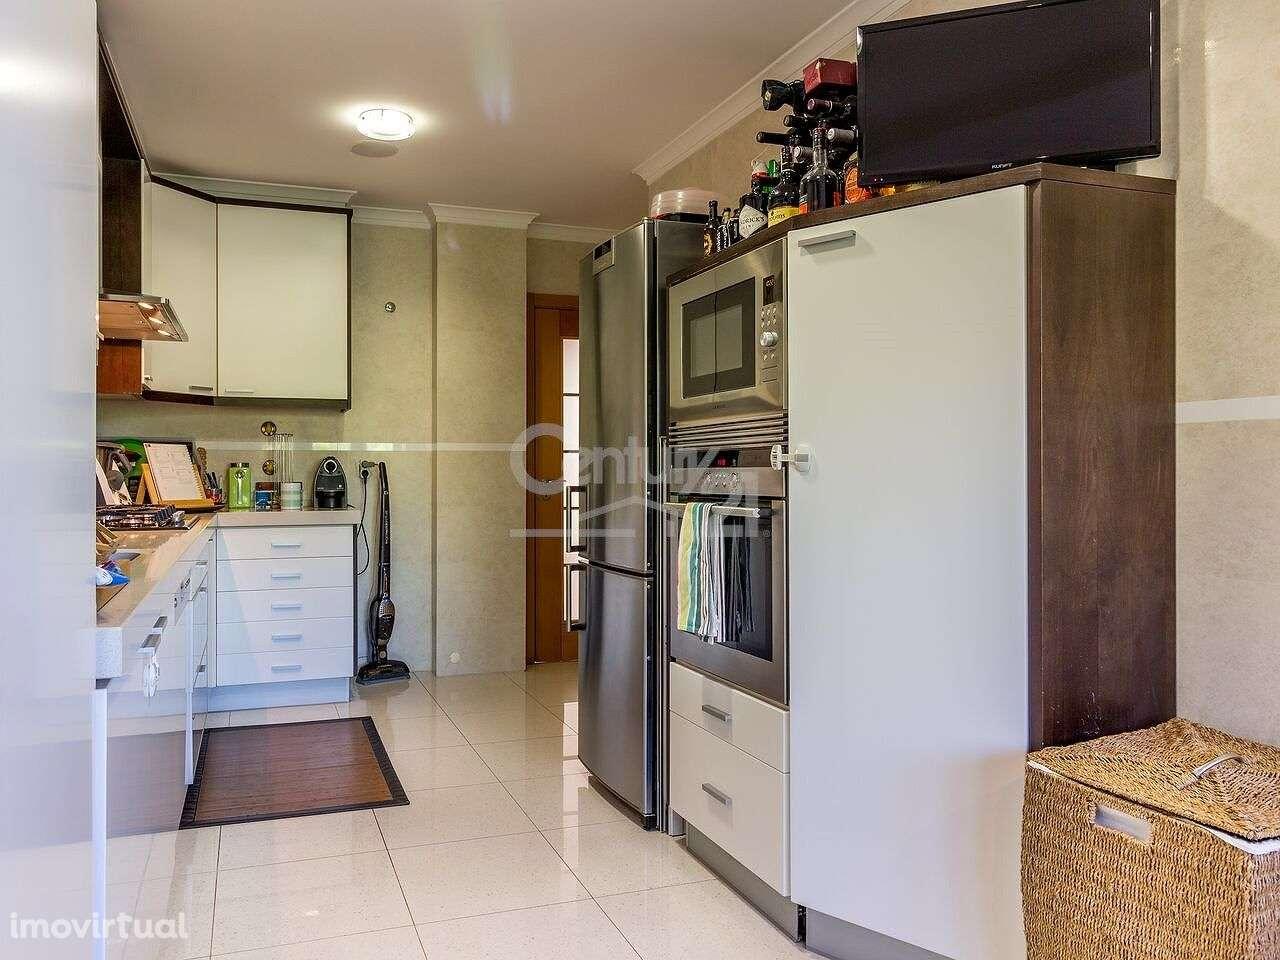 Apartamento para comprar, Cascais e Estoril, Cascais, Lisboa - Foto 11